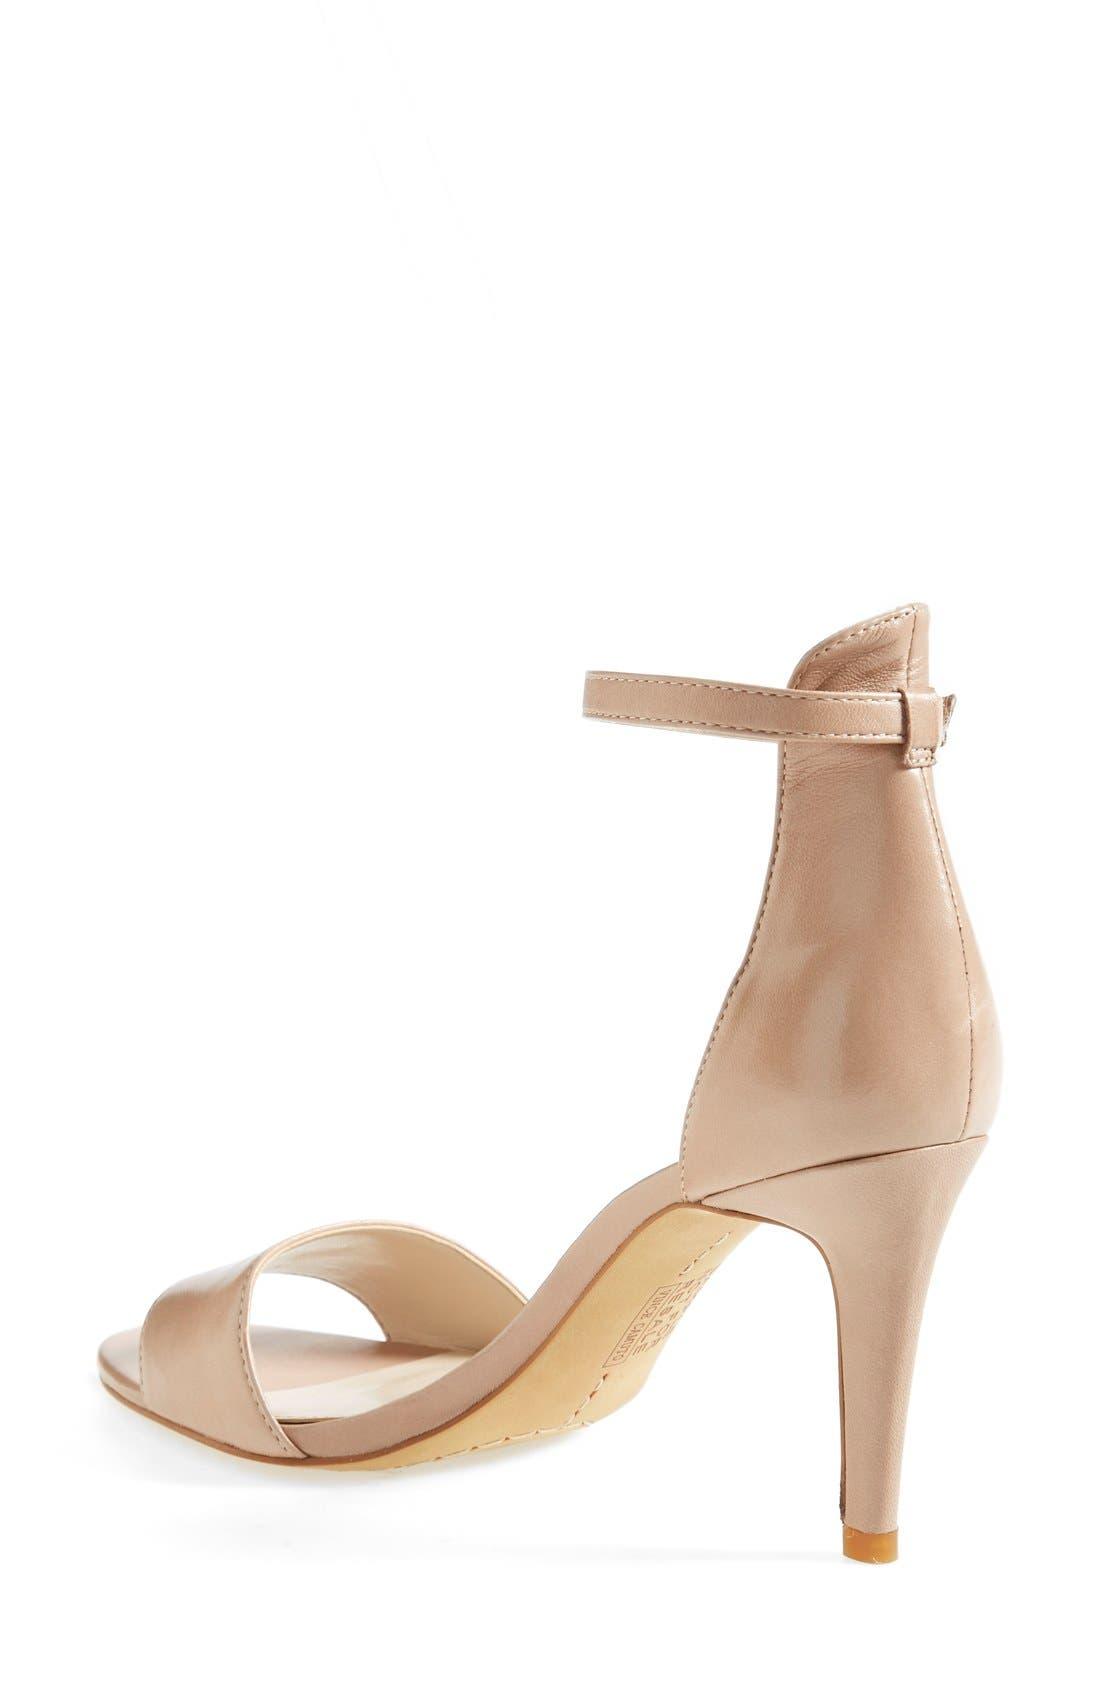 ,                             'Court' Ankle Strap Sandal,                             Alternate thumbnail 59, color,                             261